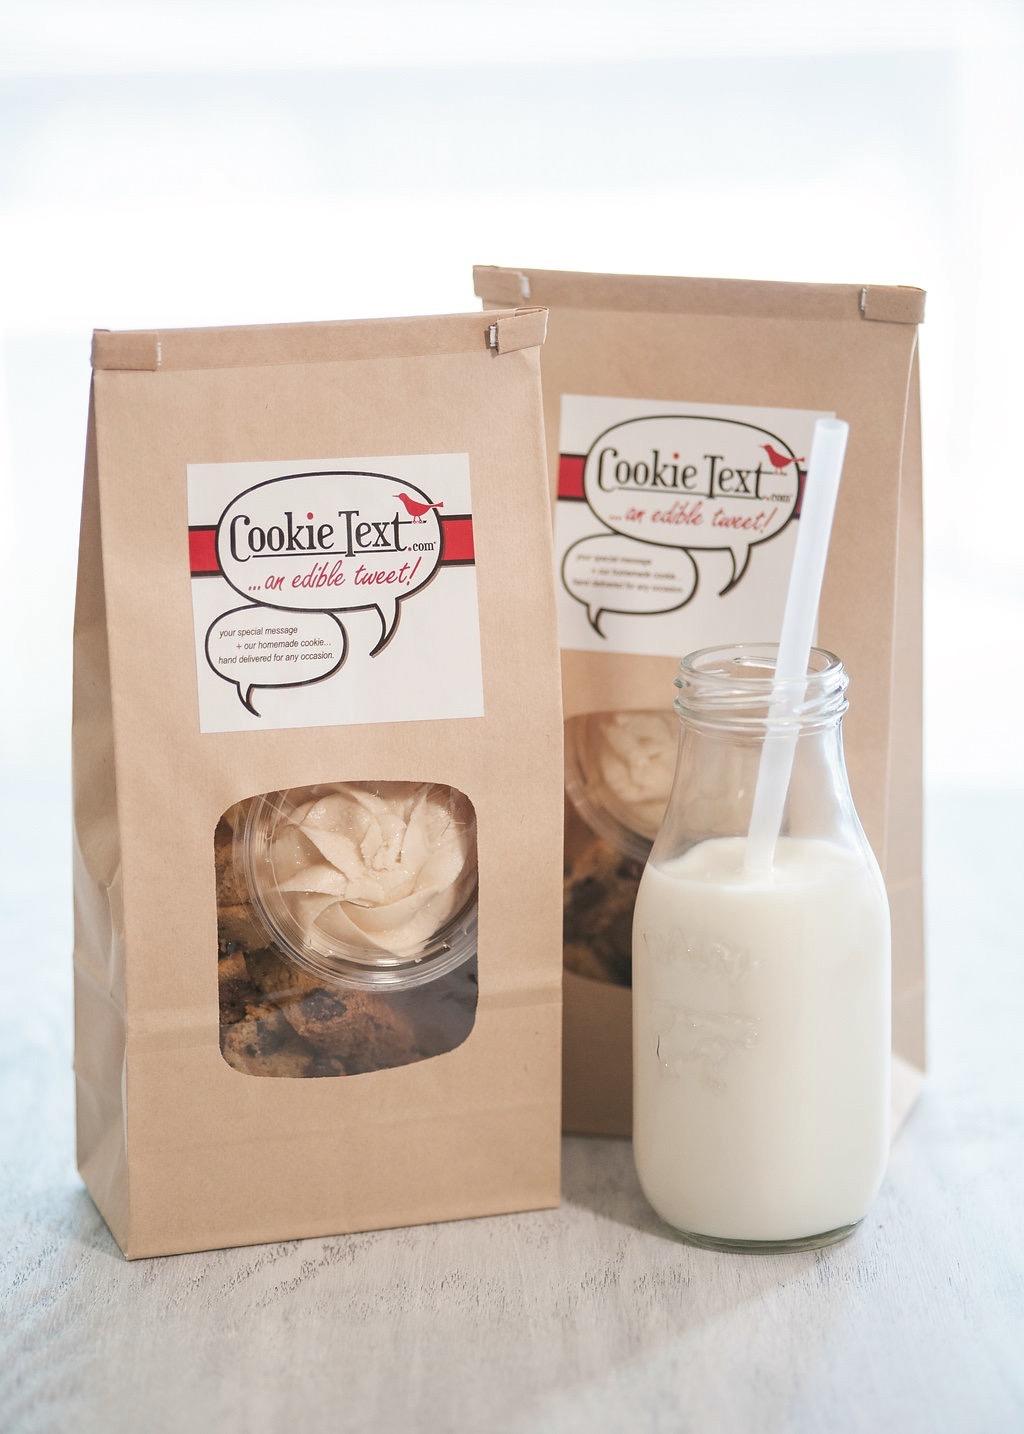 Cookie Text, Hampton Roads, Community Impact Awards, cookies